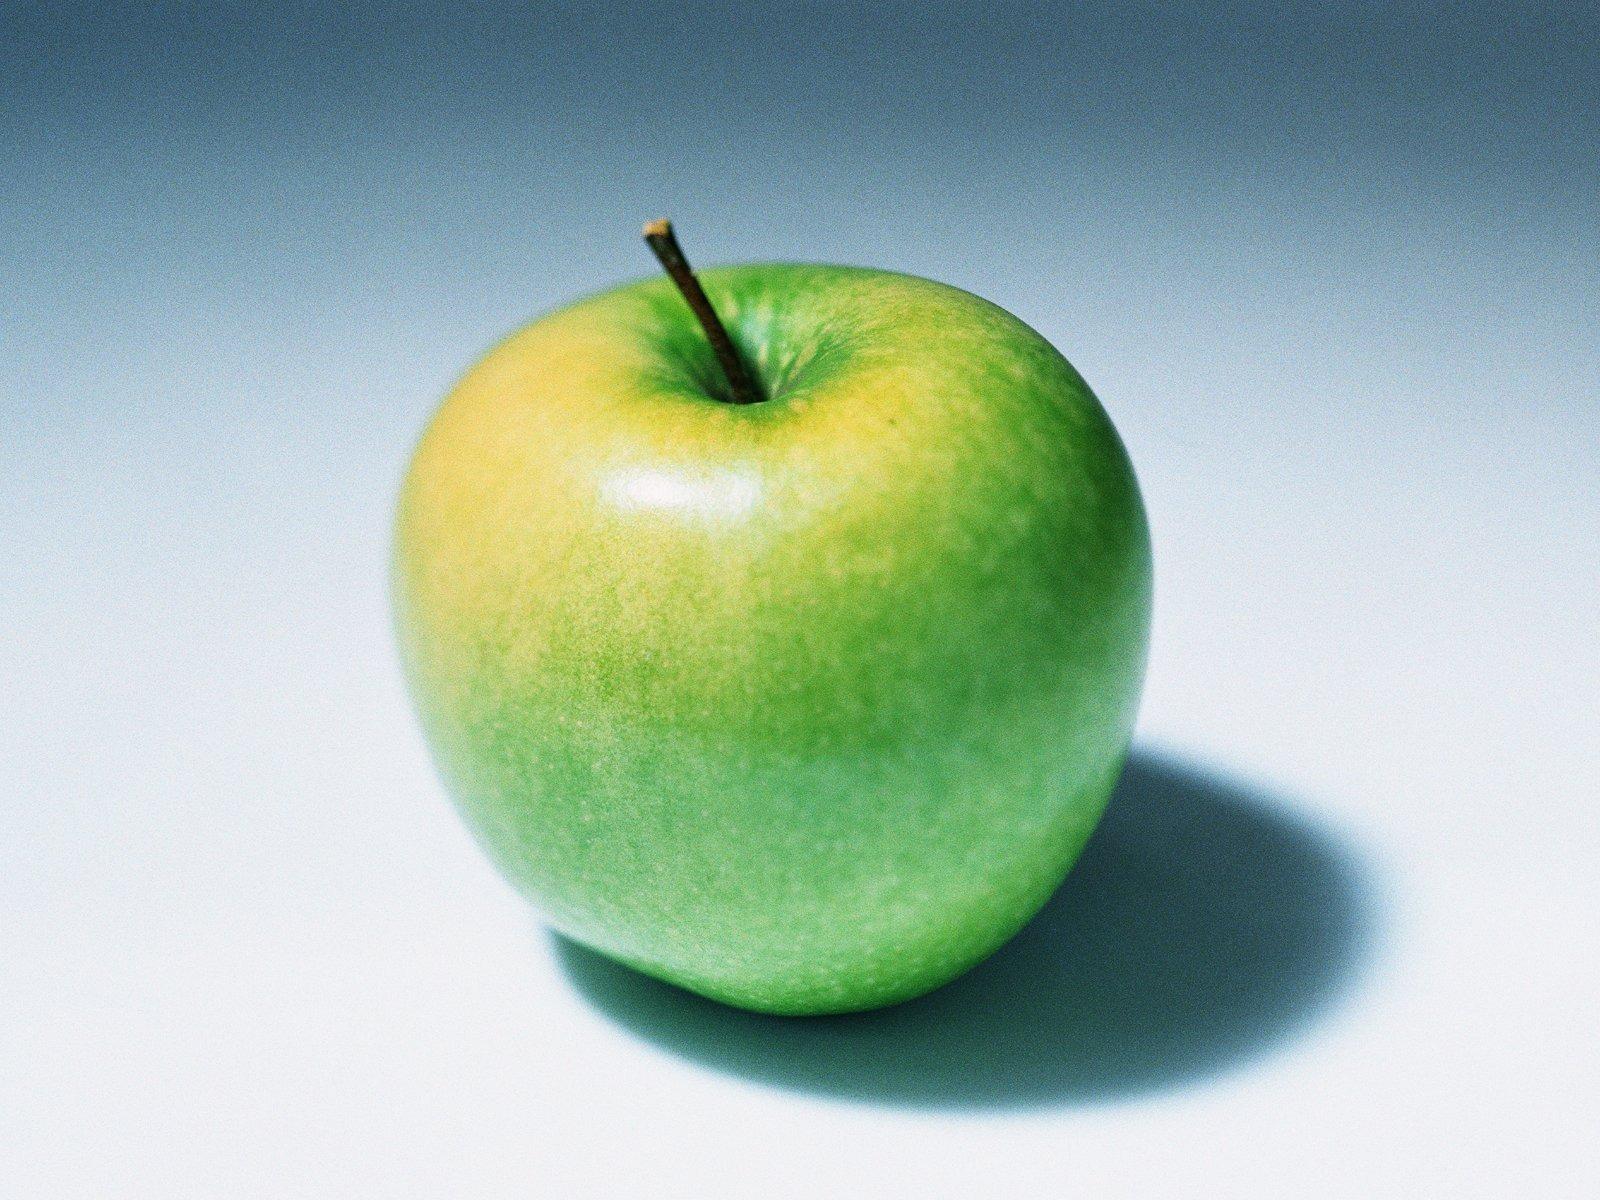 Fruit Photography Green Apple Wallpaper Australia Wallpaper